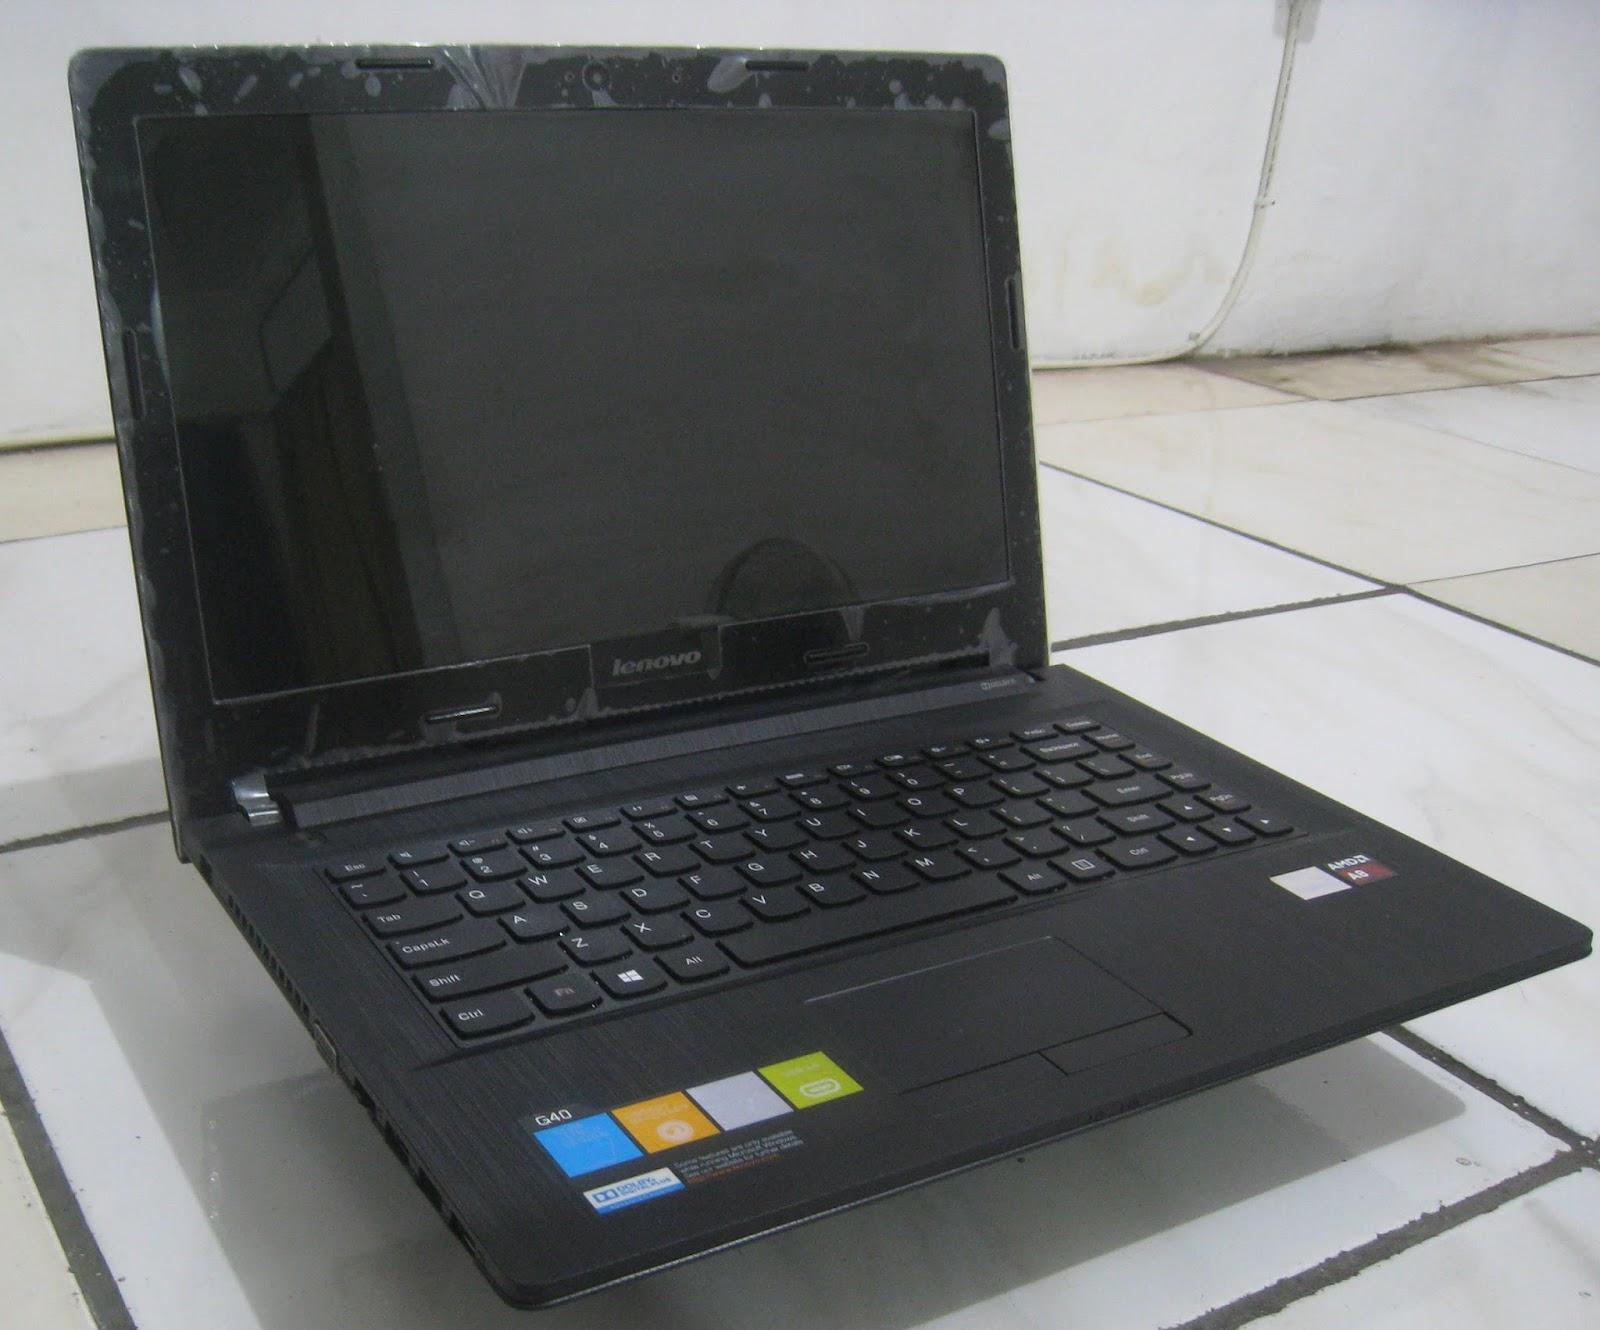 Laptop Gaming Lenovo G40 45 Amd A8 Jual Beli Laptop Kamera Bekas Service Sparepart Di Malang